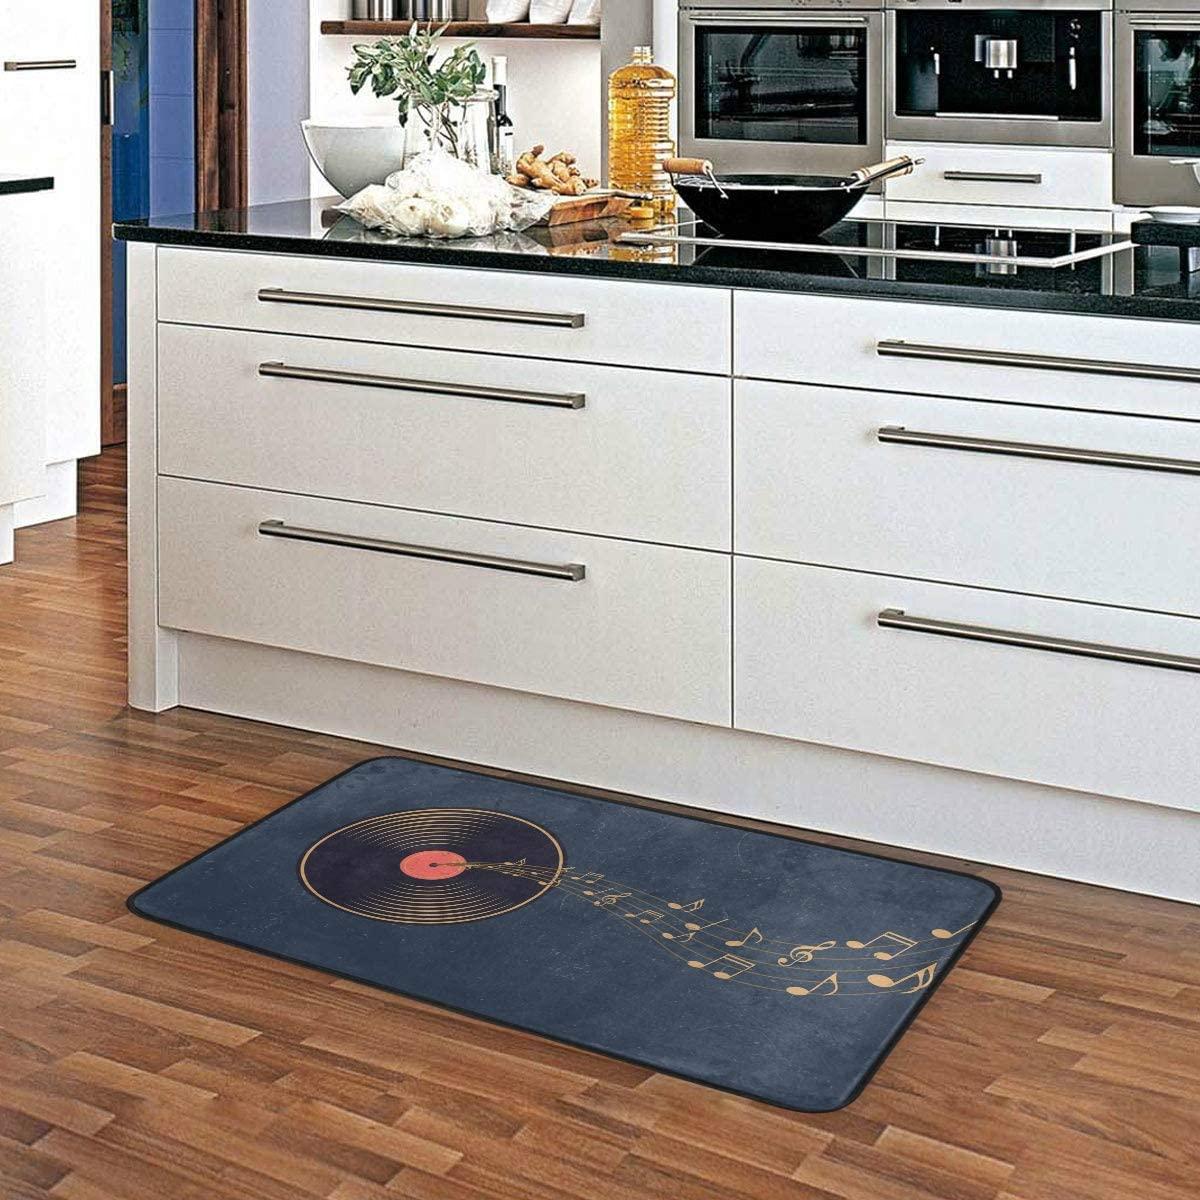 ALAZA Music Note Non Slip Kitchen Floor Mat Kitchen Rug for Entryway Hallway Bathroom Living Room Bedroom 39 x 20 inches(1.7' x 3.3')